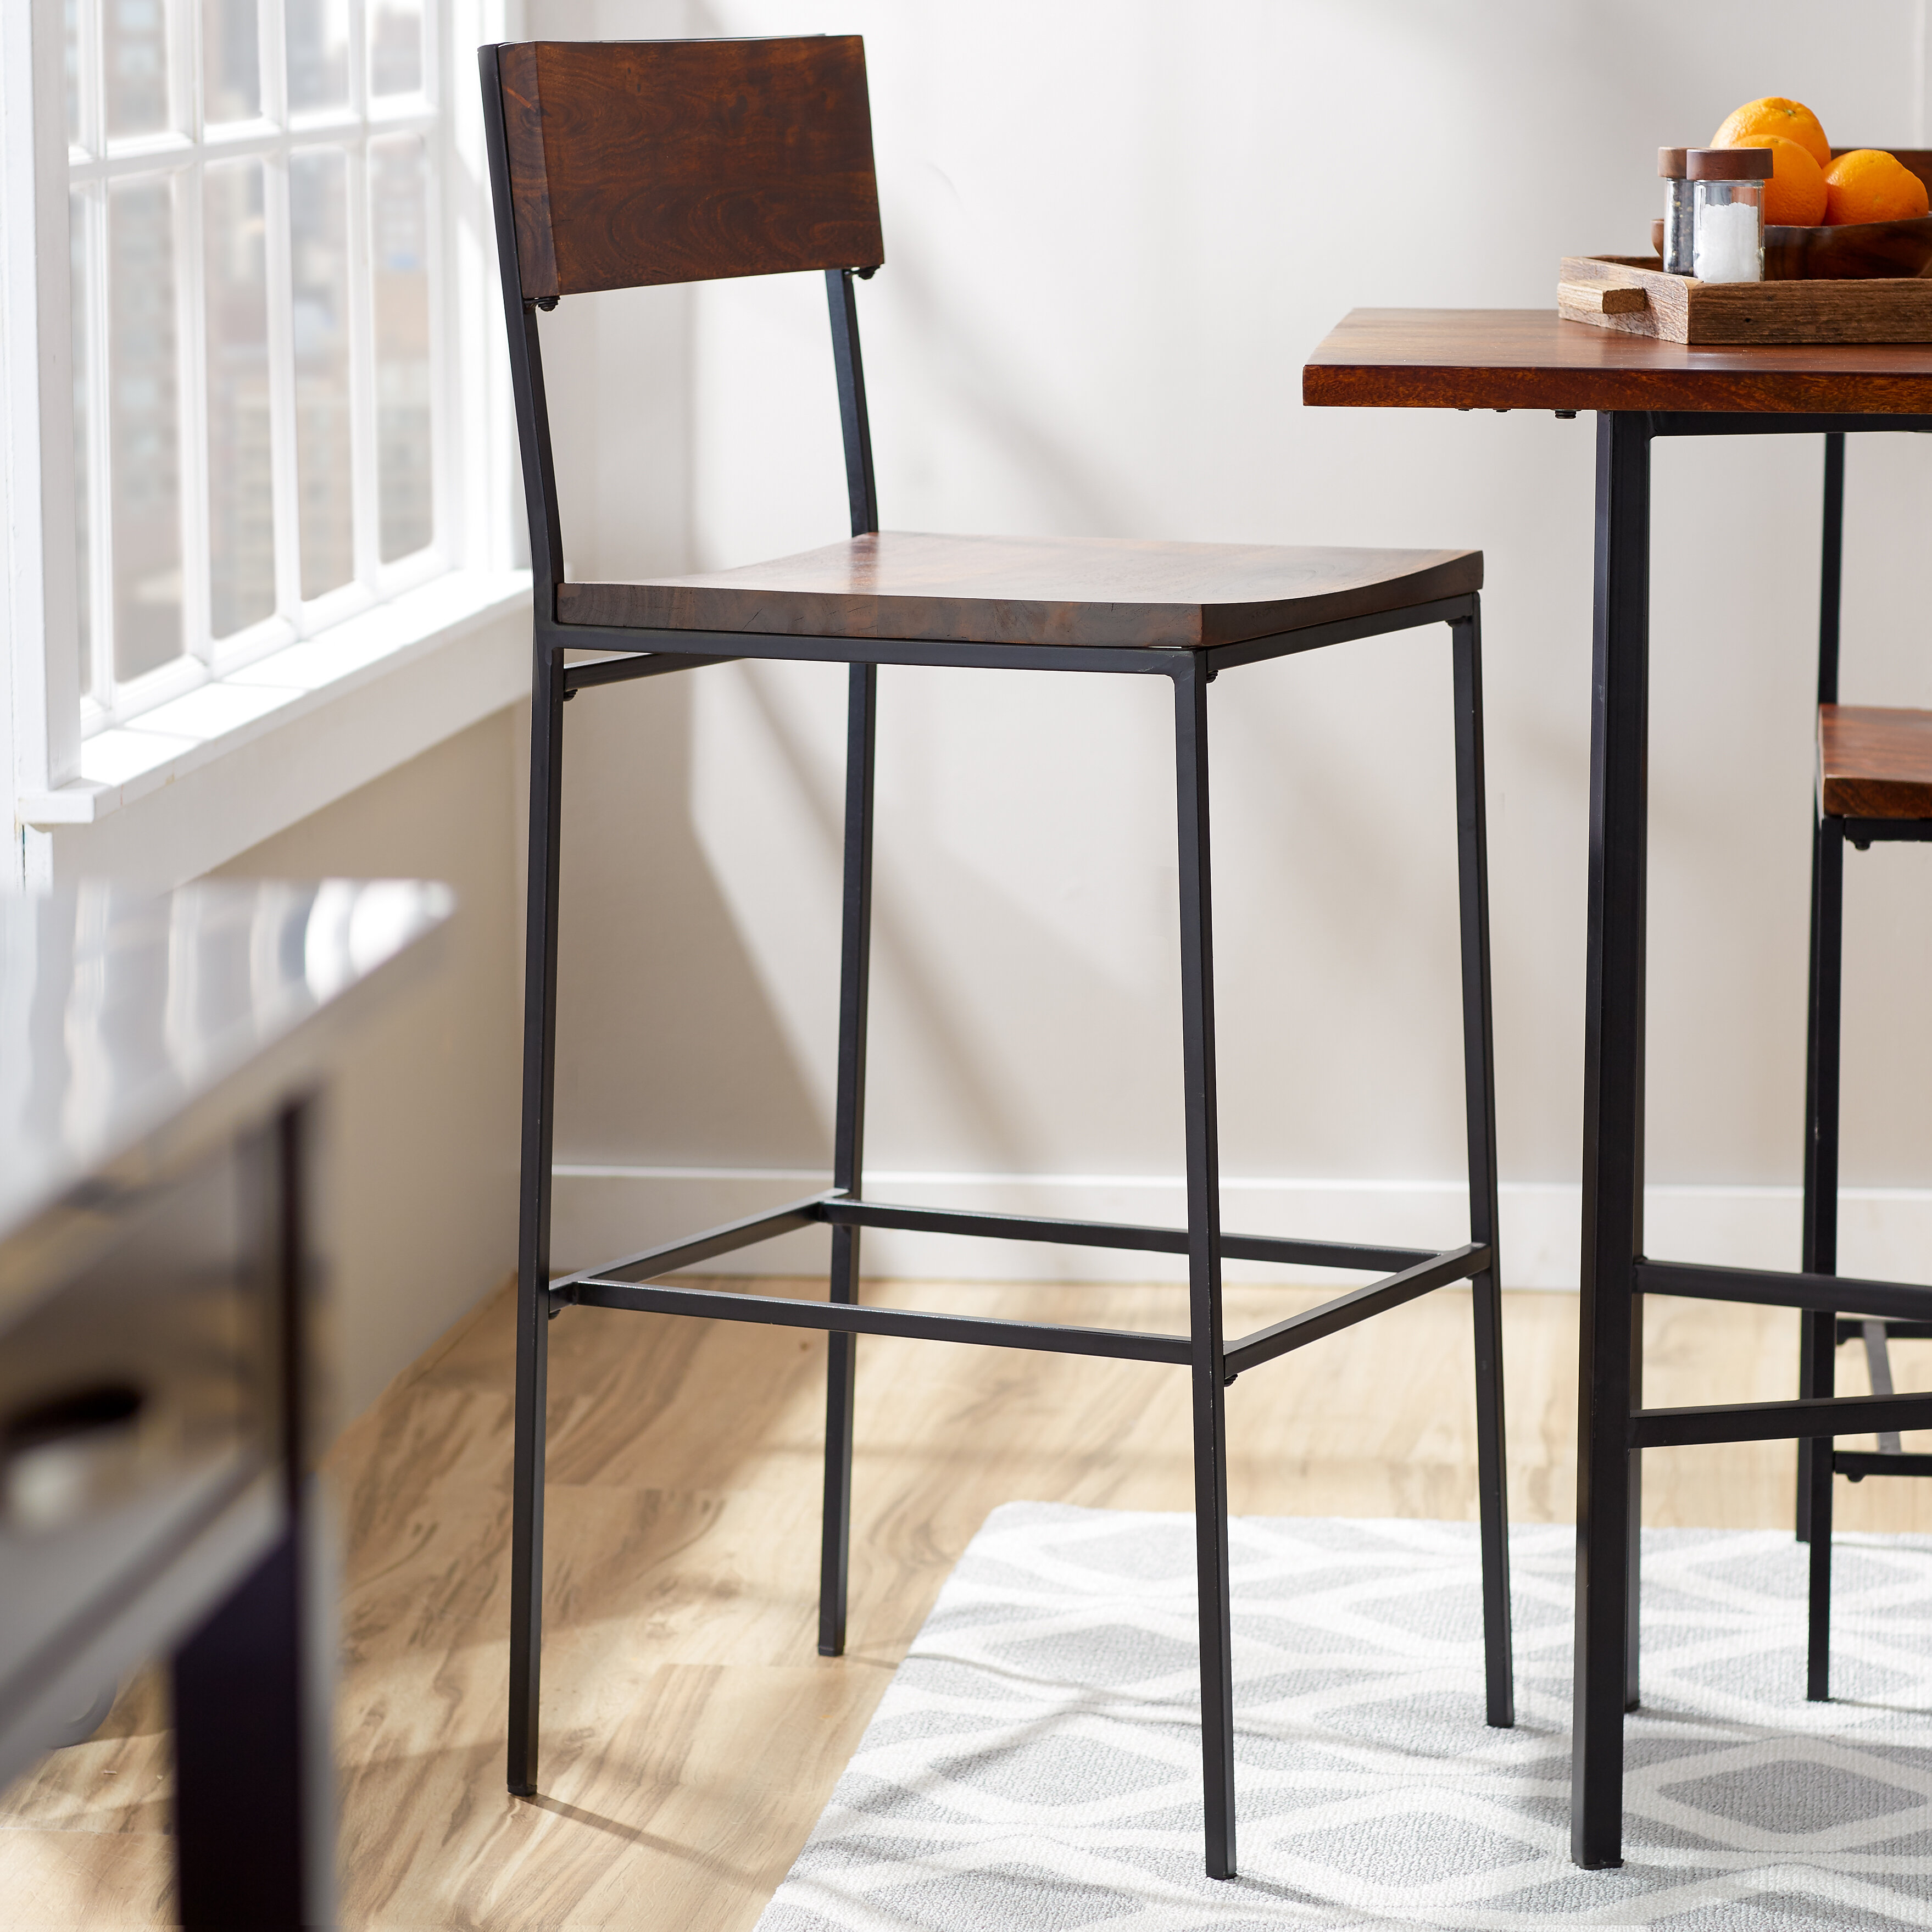 30 in bar stools. 30 In Bar Stools R